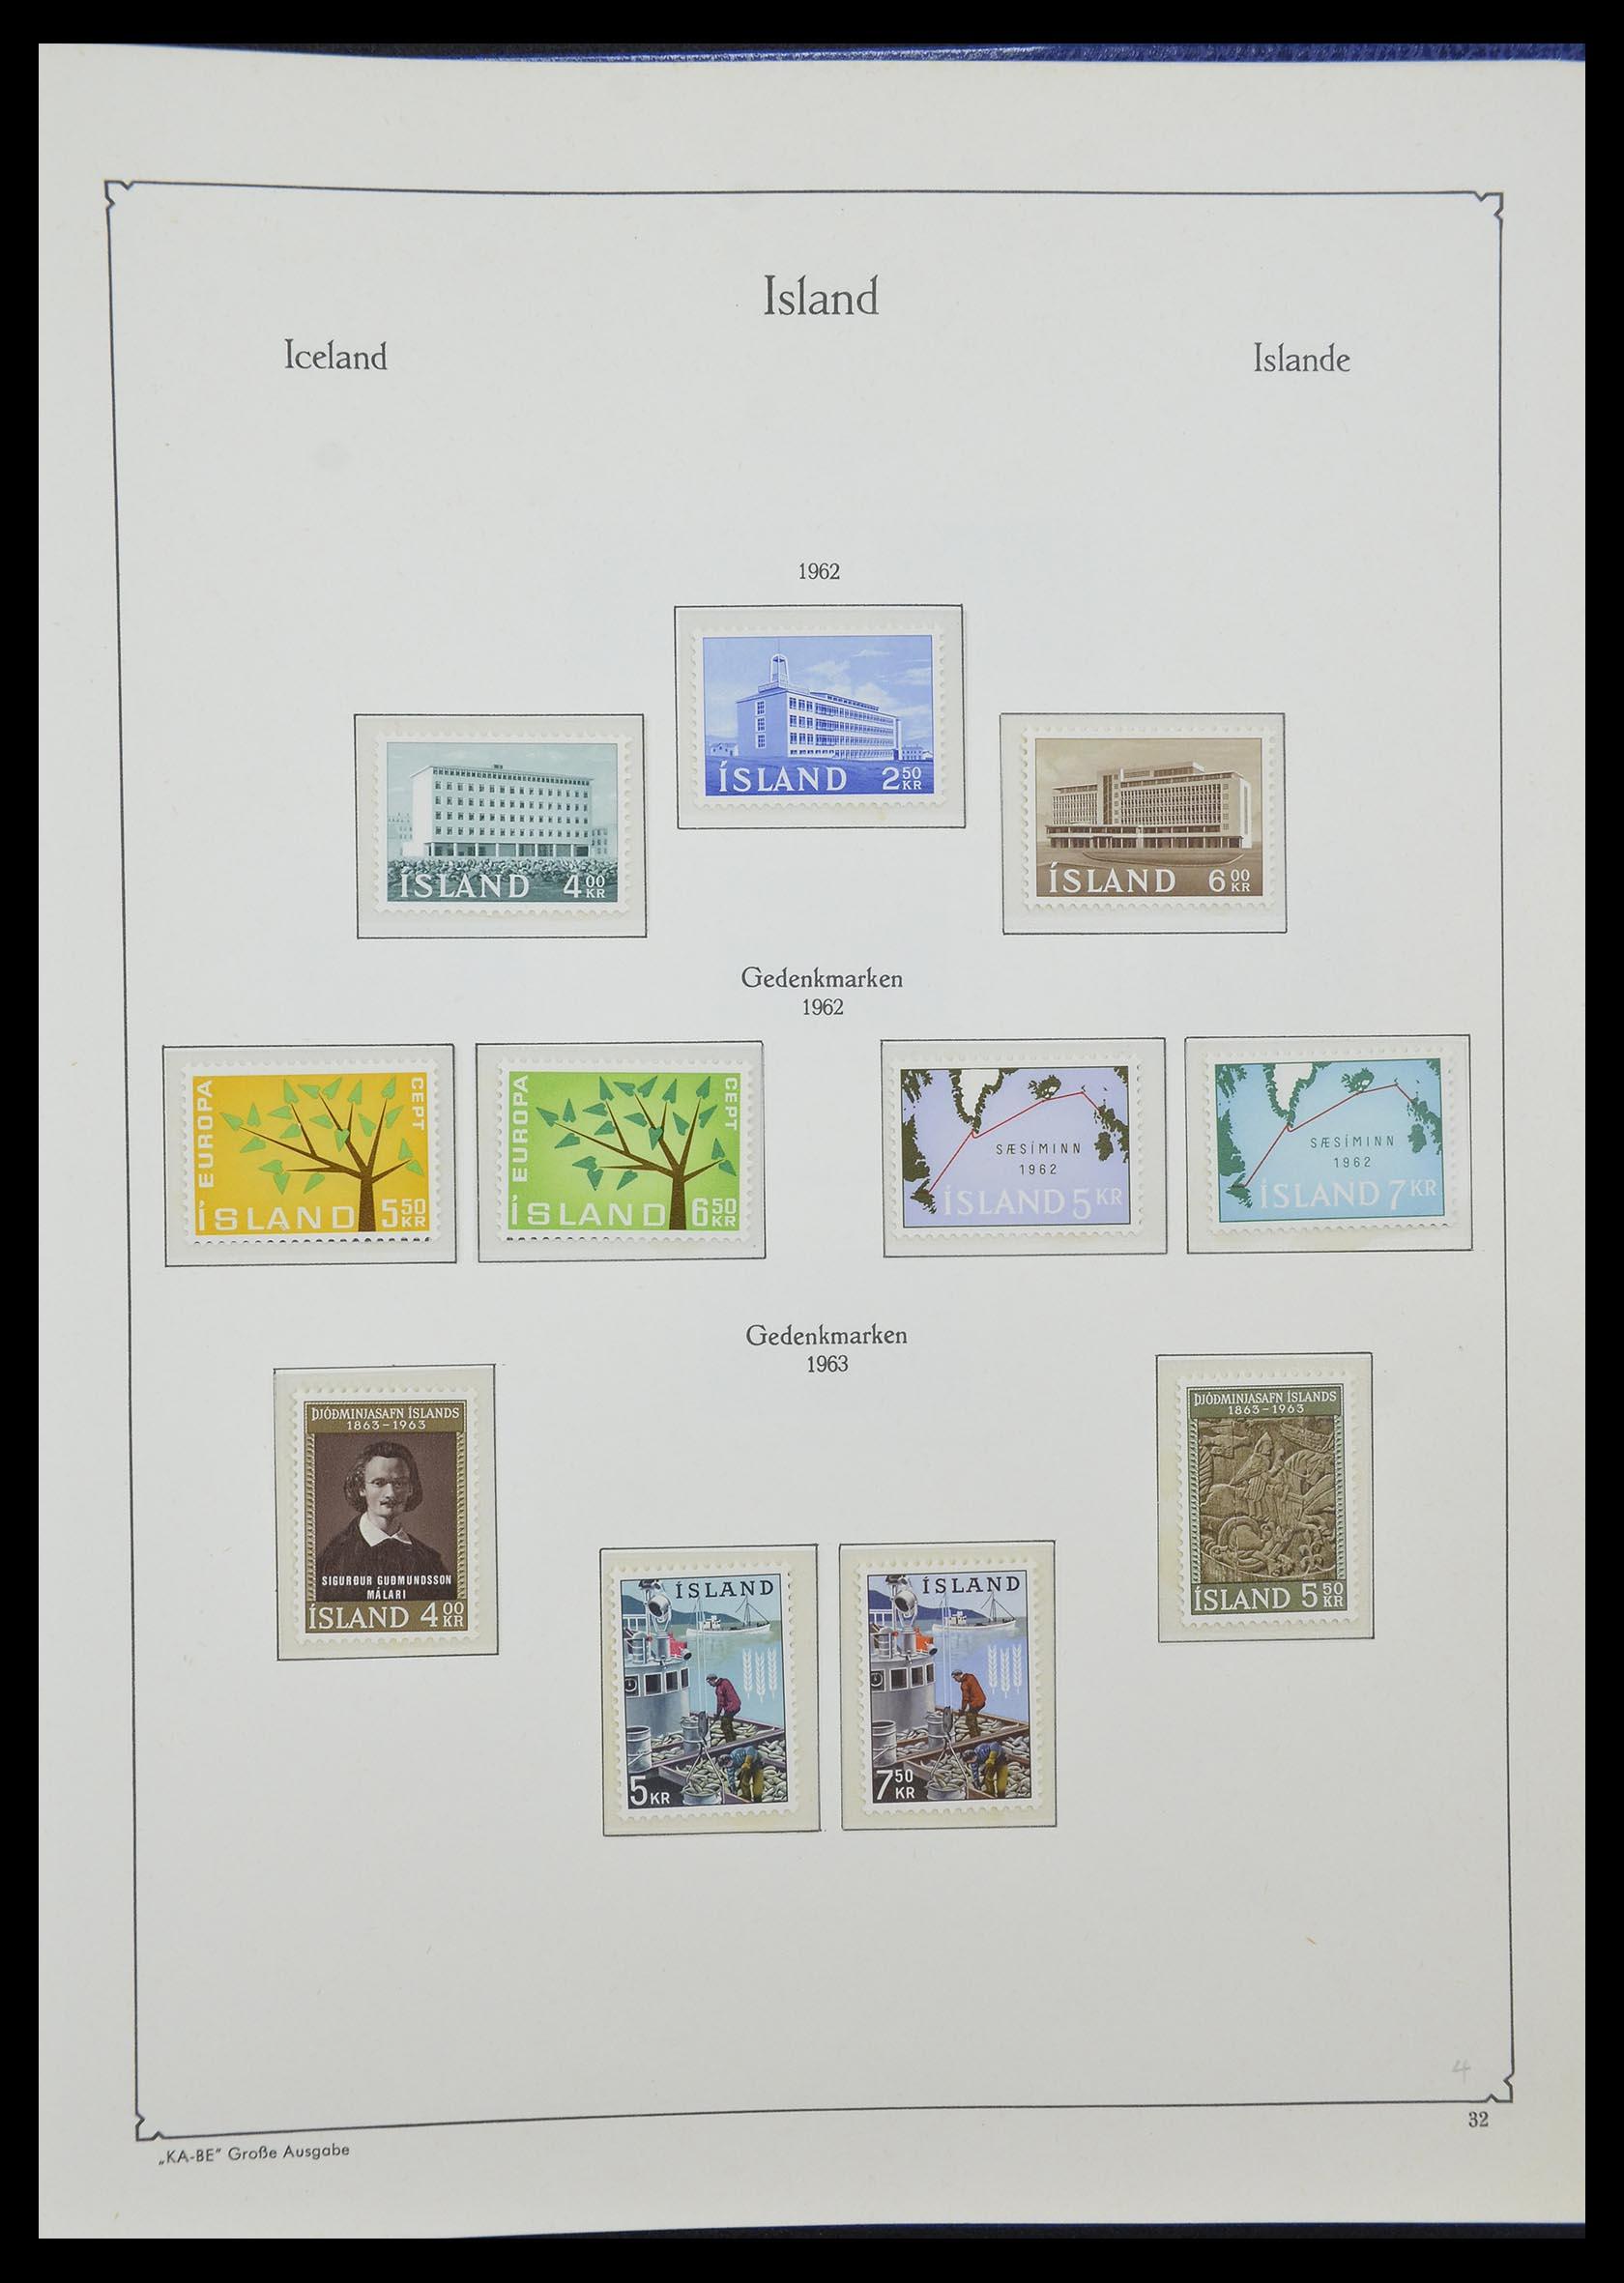 33185 015 - Postzegelverzameling 33184 Finland 1856-1990.